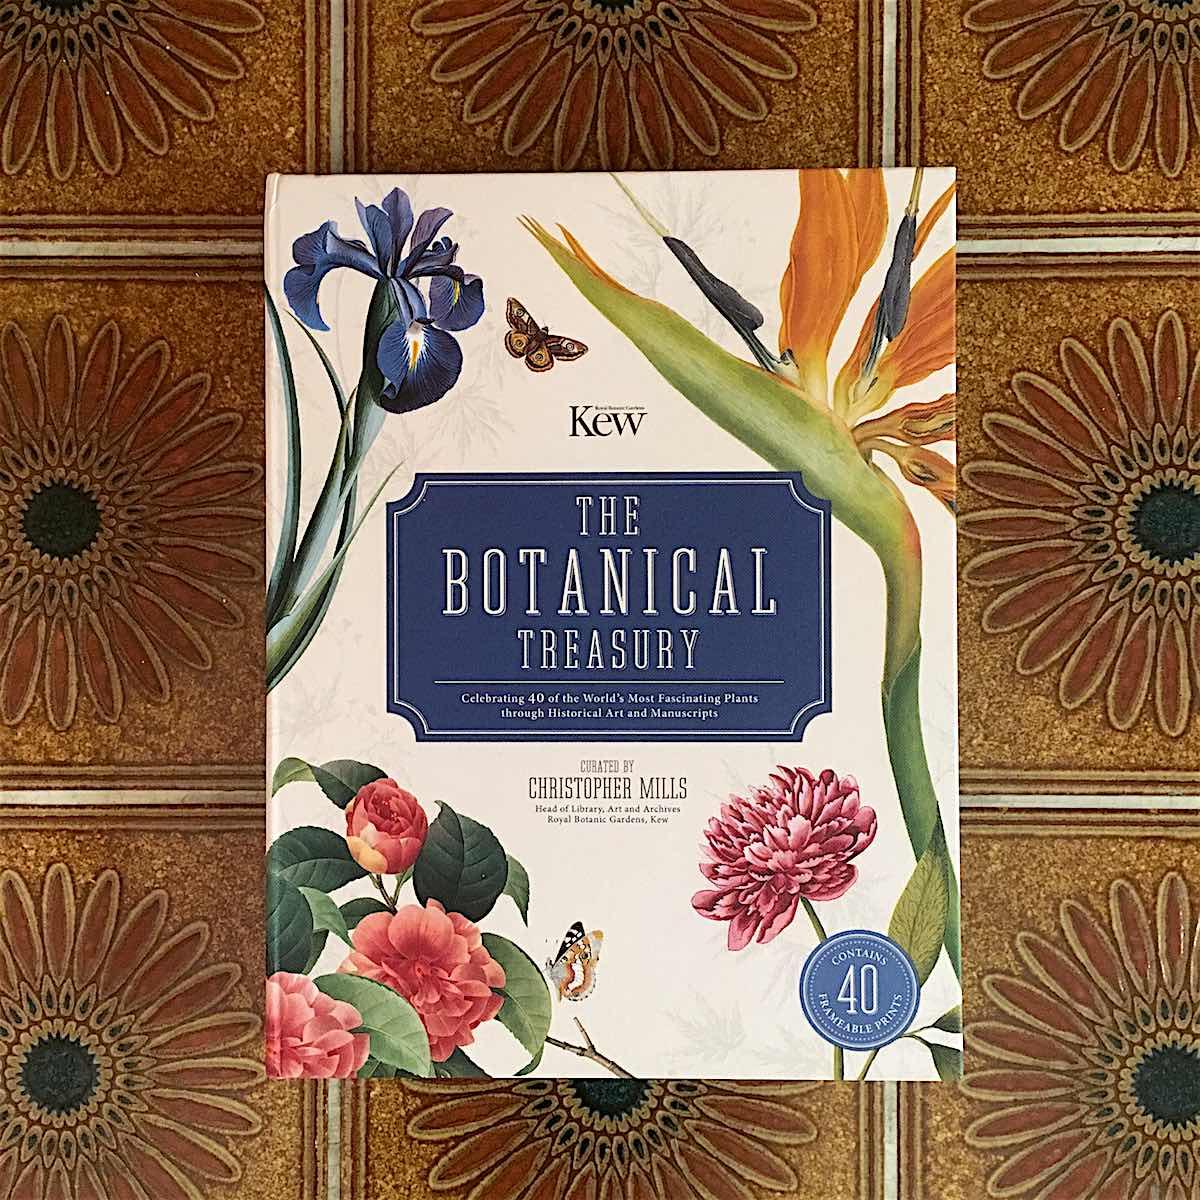 The Botanical Treasury celebrates 40 of the world's most fascinating plants